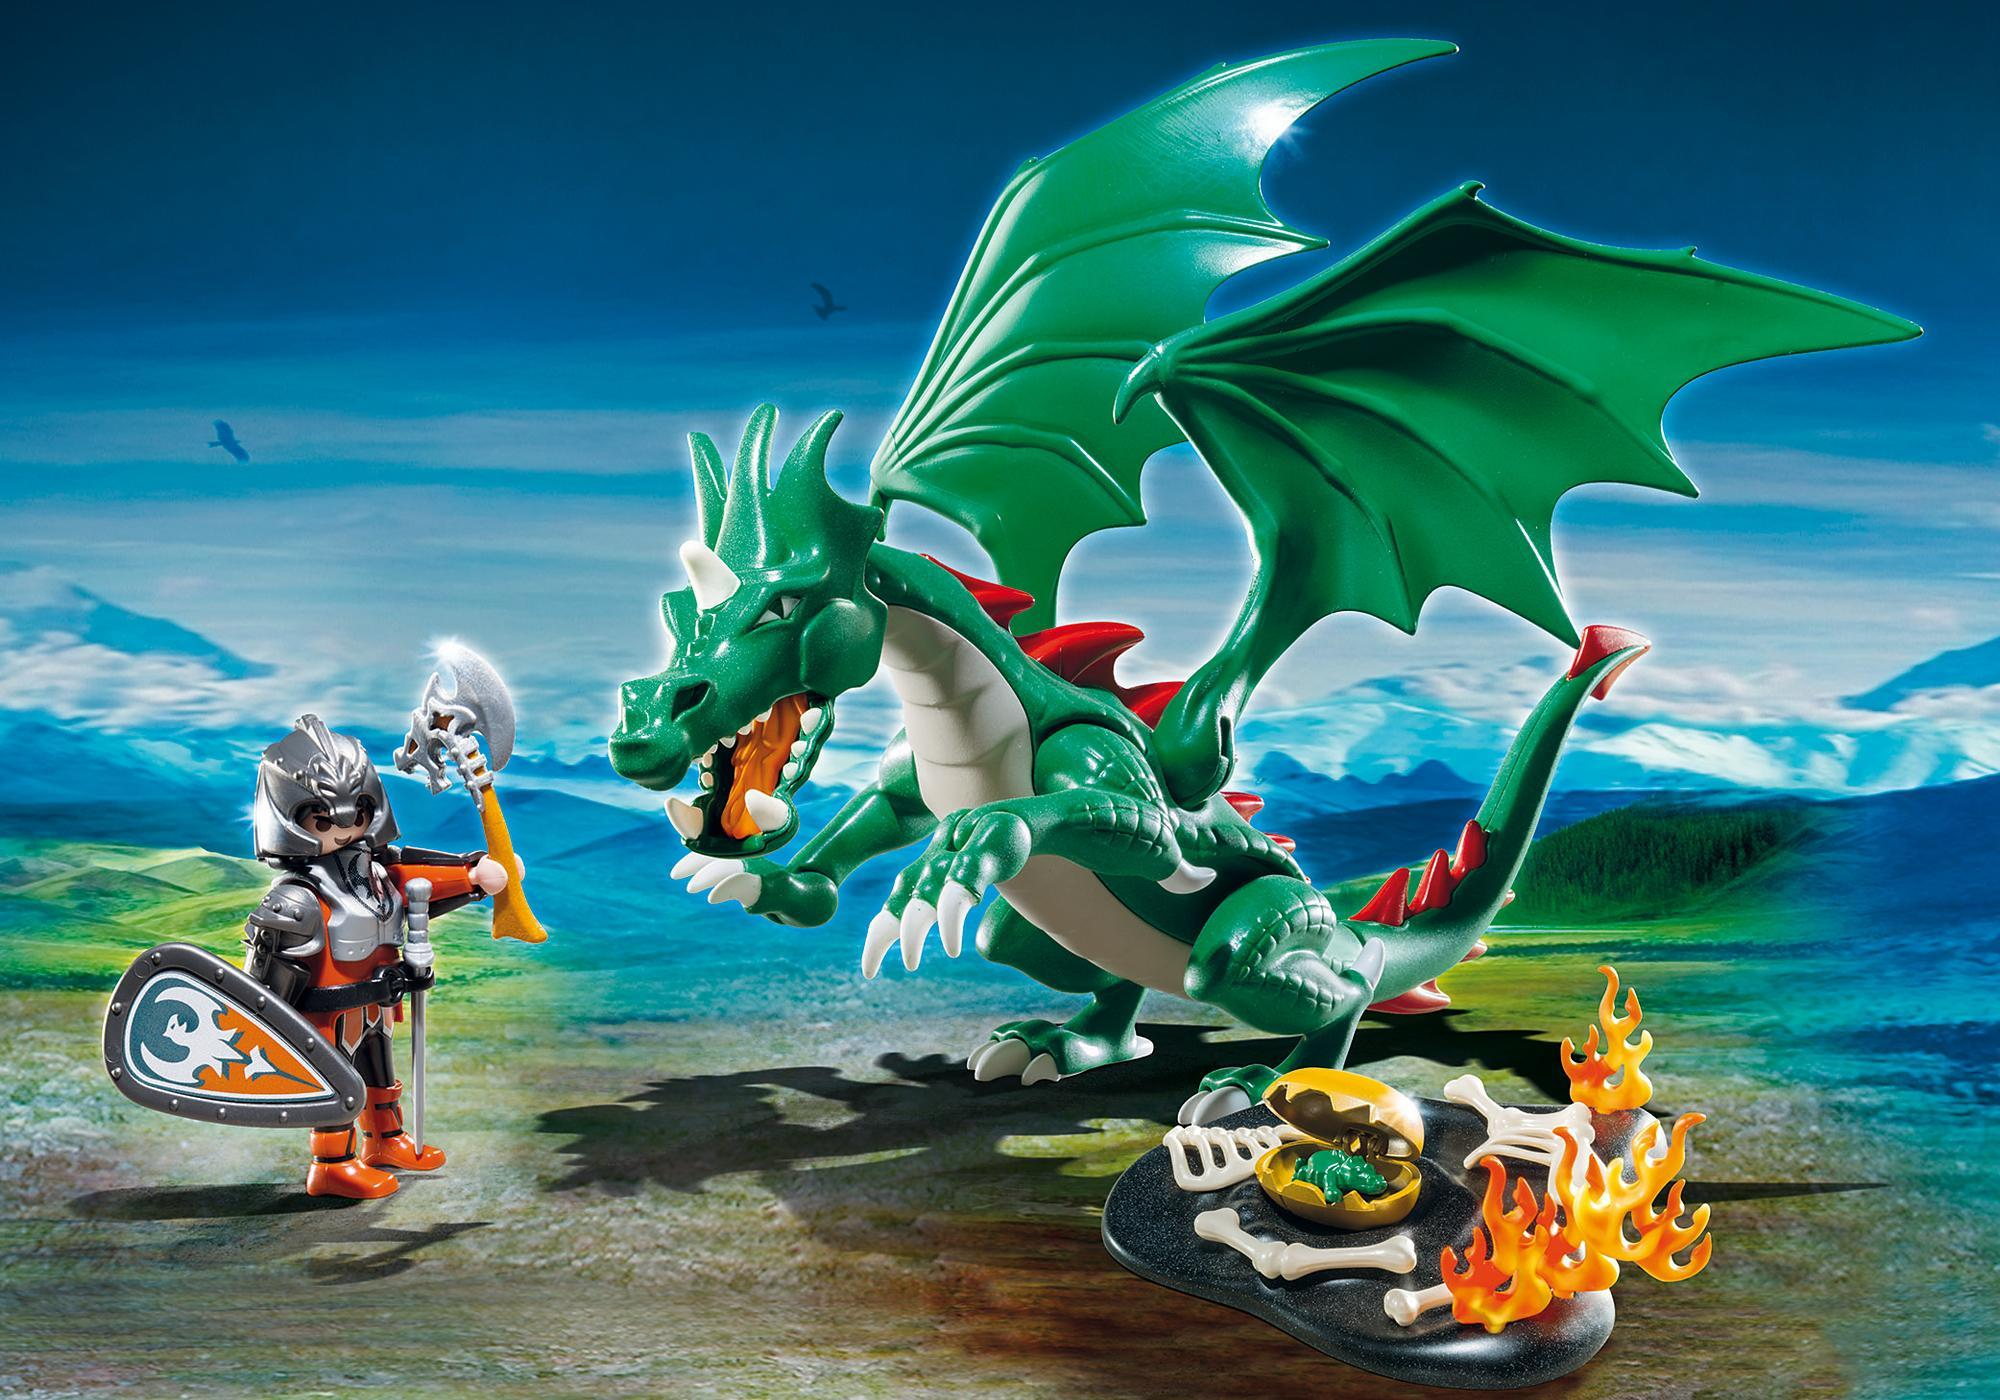 http://media.playmobil.com/i/playmobil/6003_product_detail/Chevalier avec grand dragon vert